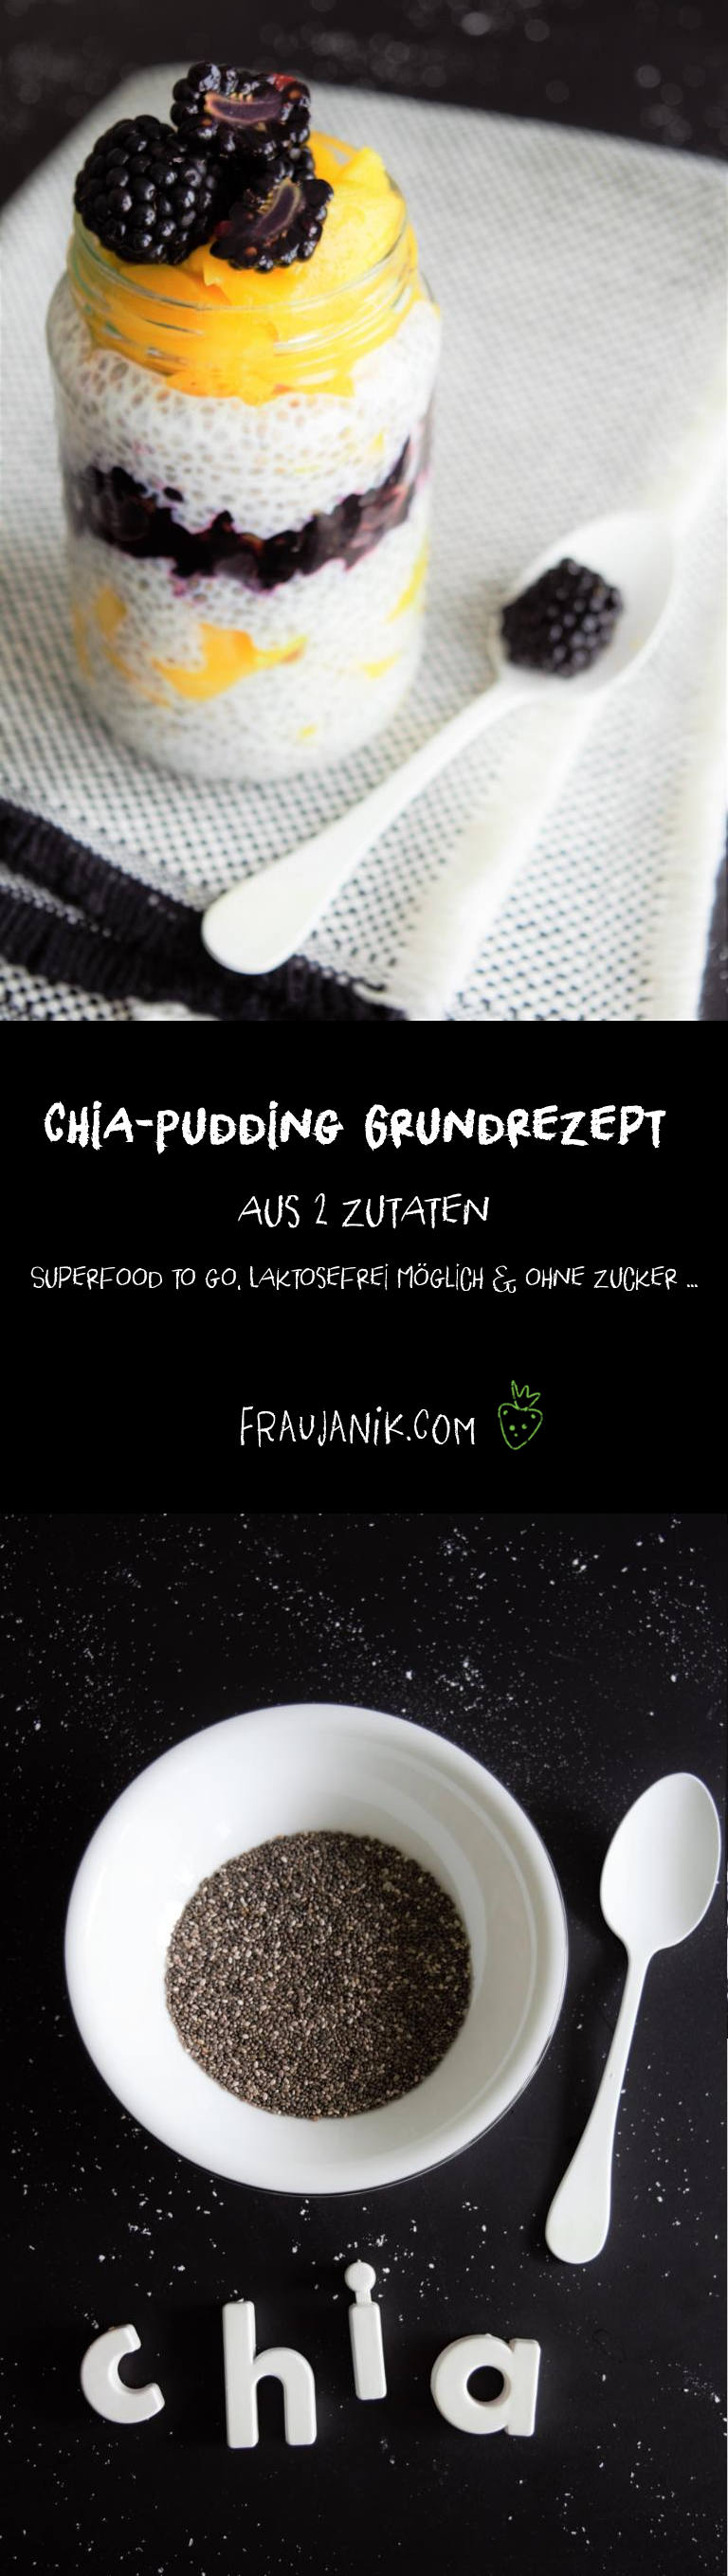 Chia-Pudding Grundrezept, vegan